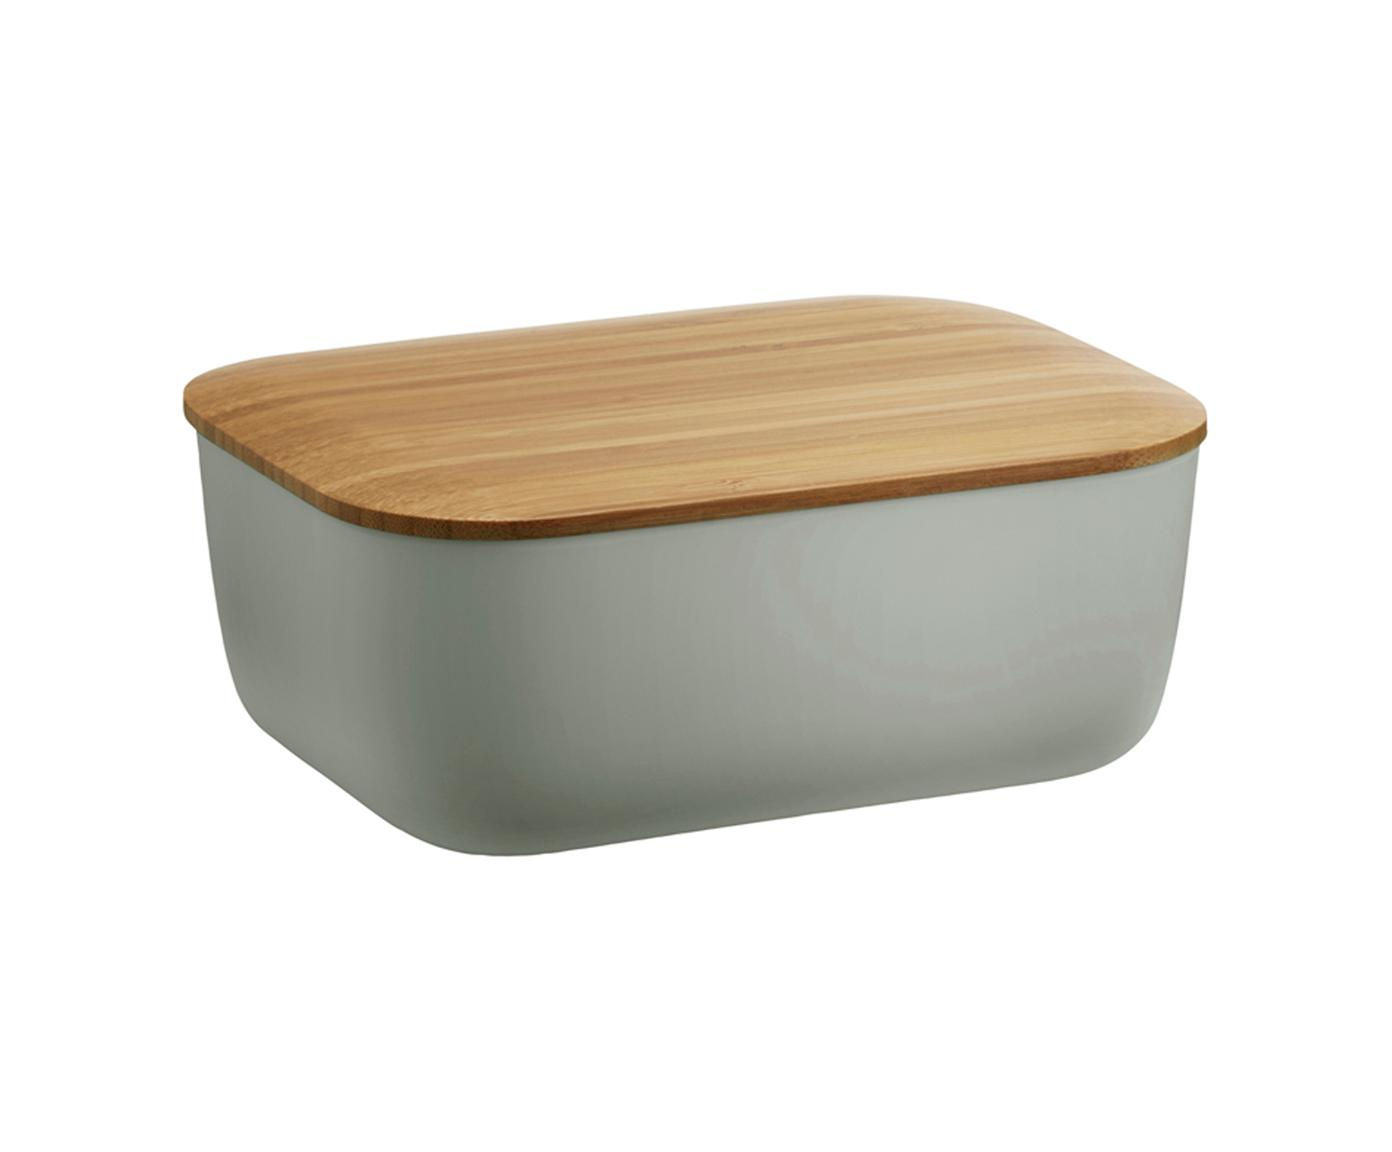 Butterdose Box-It, Dose: Melamin, Deckel: Bambus, Grau, Bambus, 15 x 7 cm